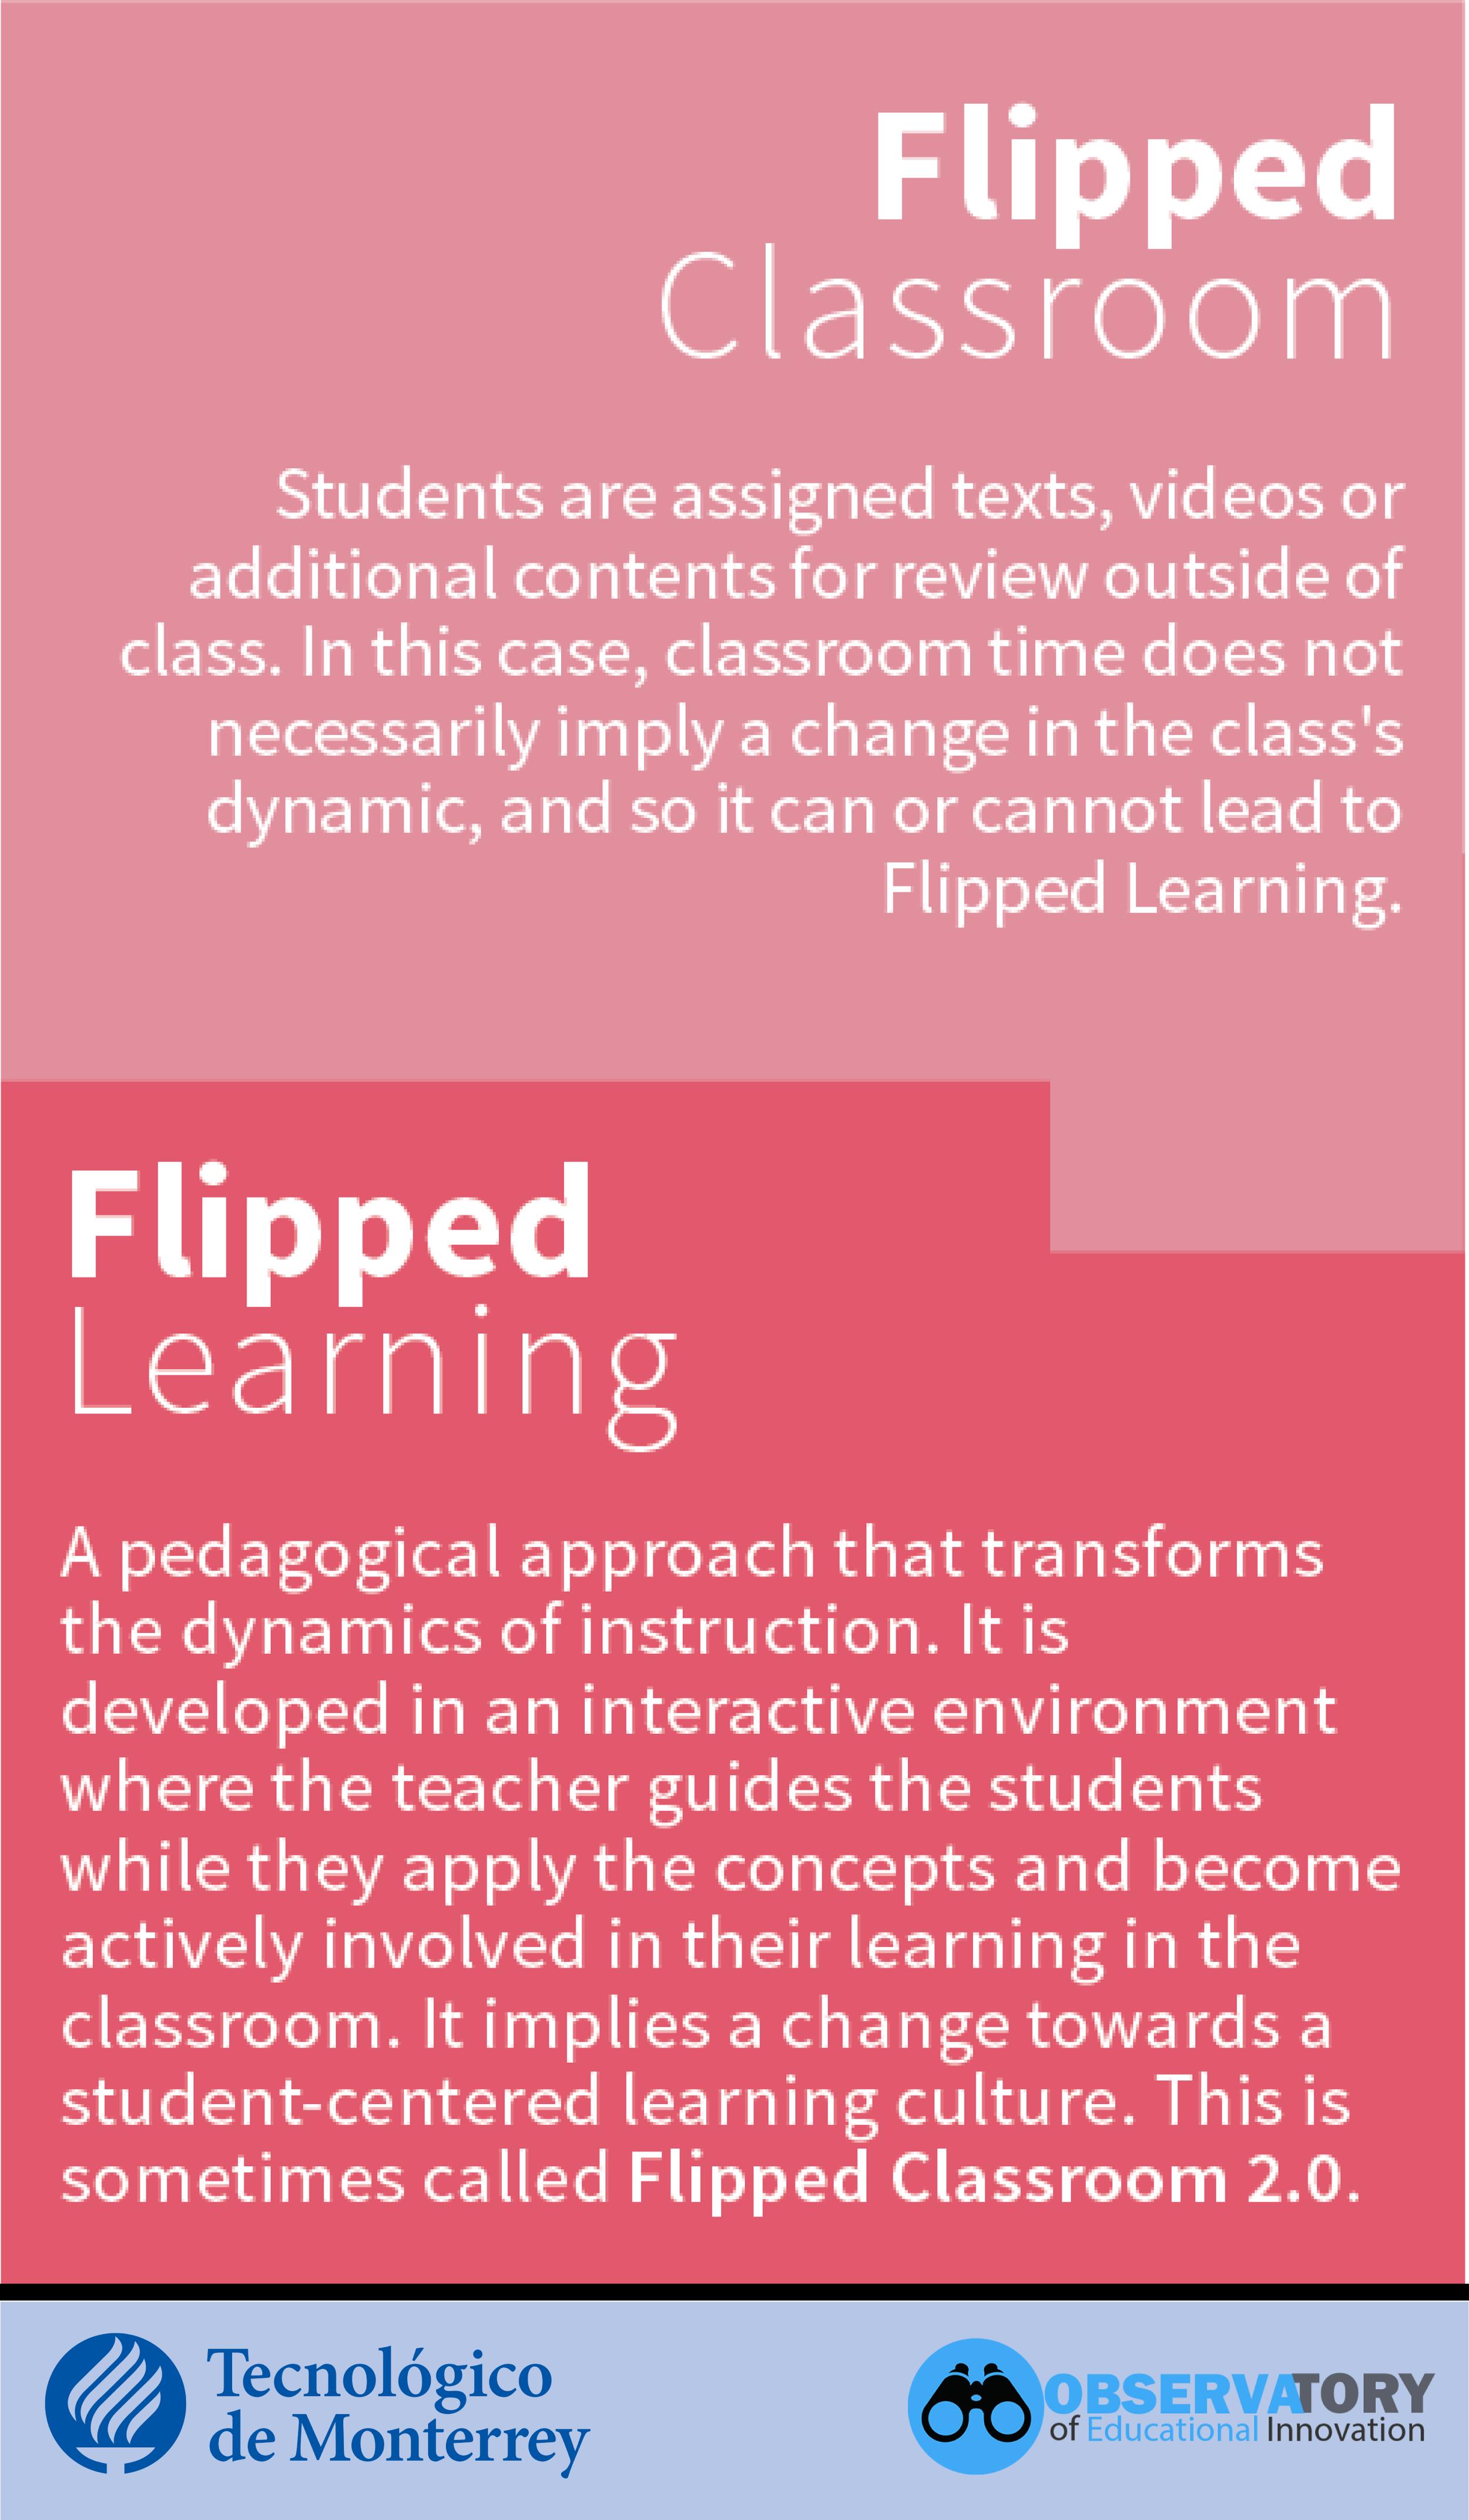 Flipped Classroom vs Flipped Learning